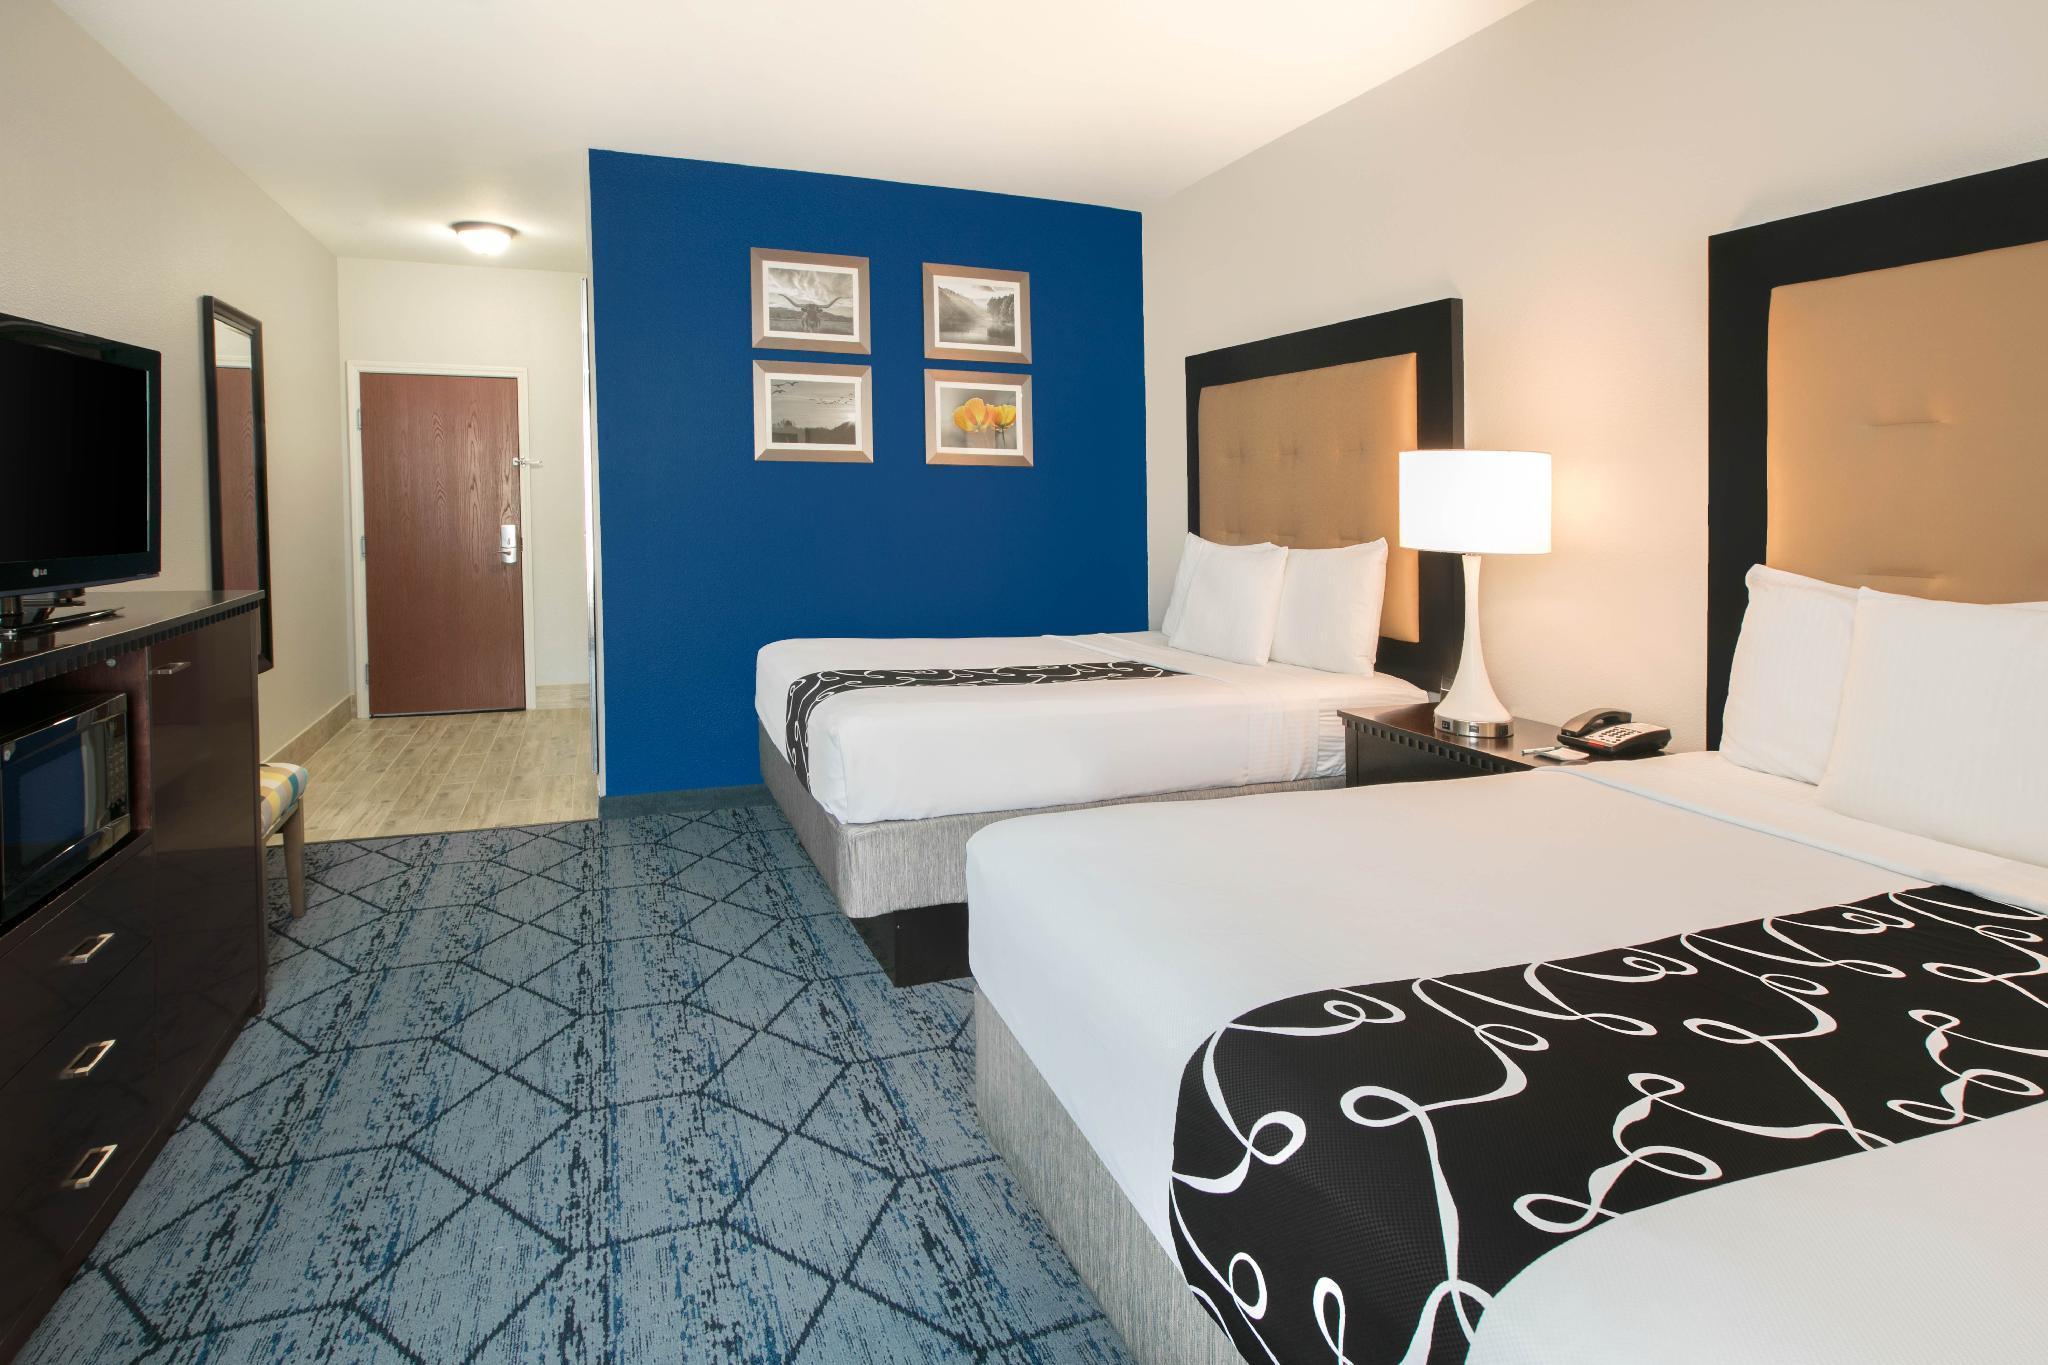 La Quinta Inn & Suites by Wyndham Denton - University Drive